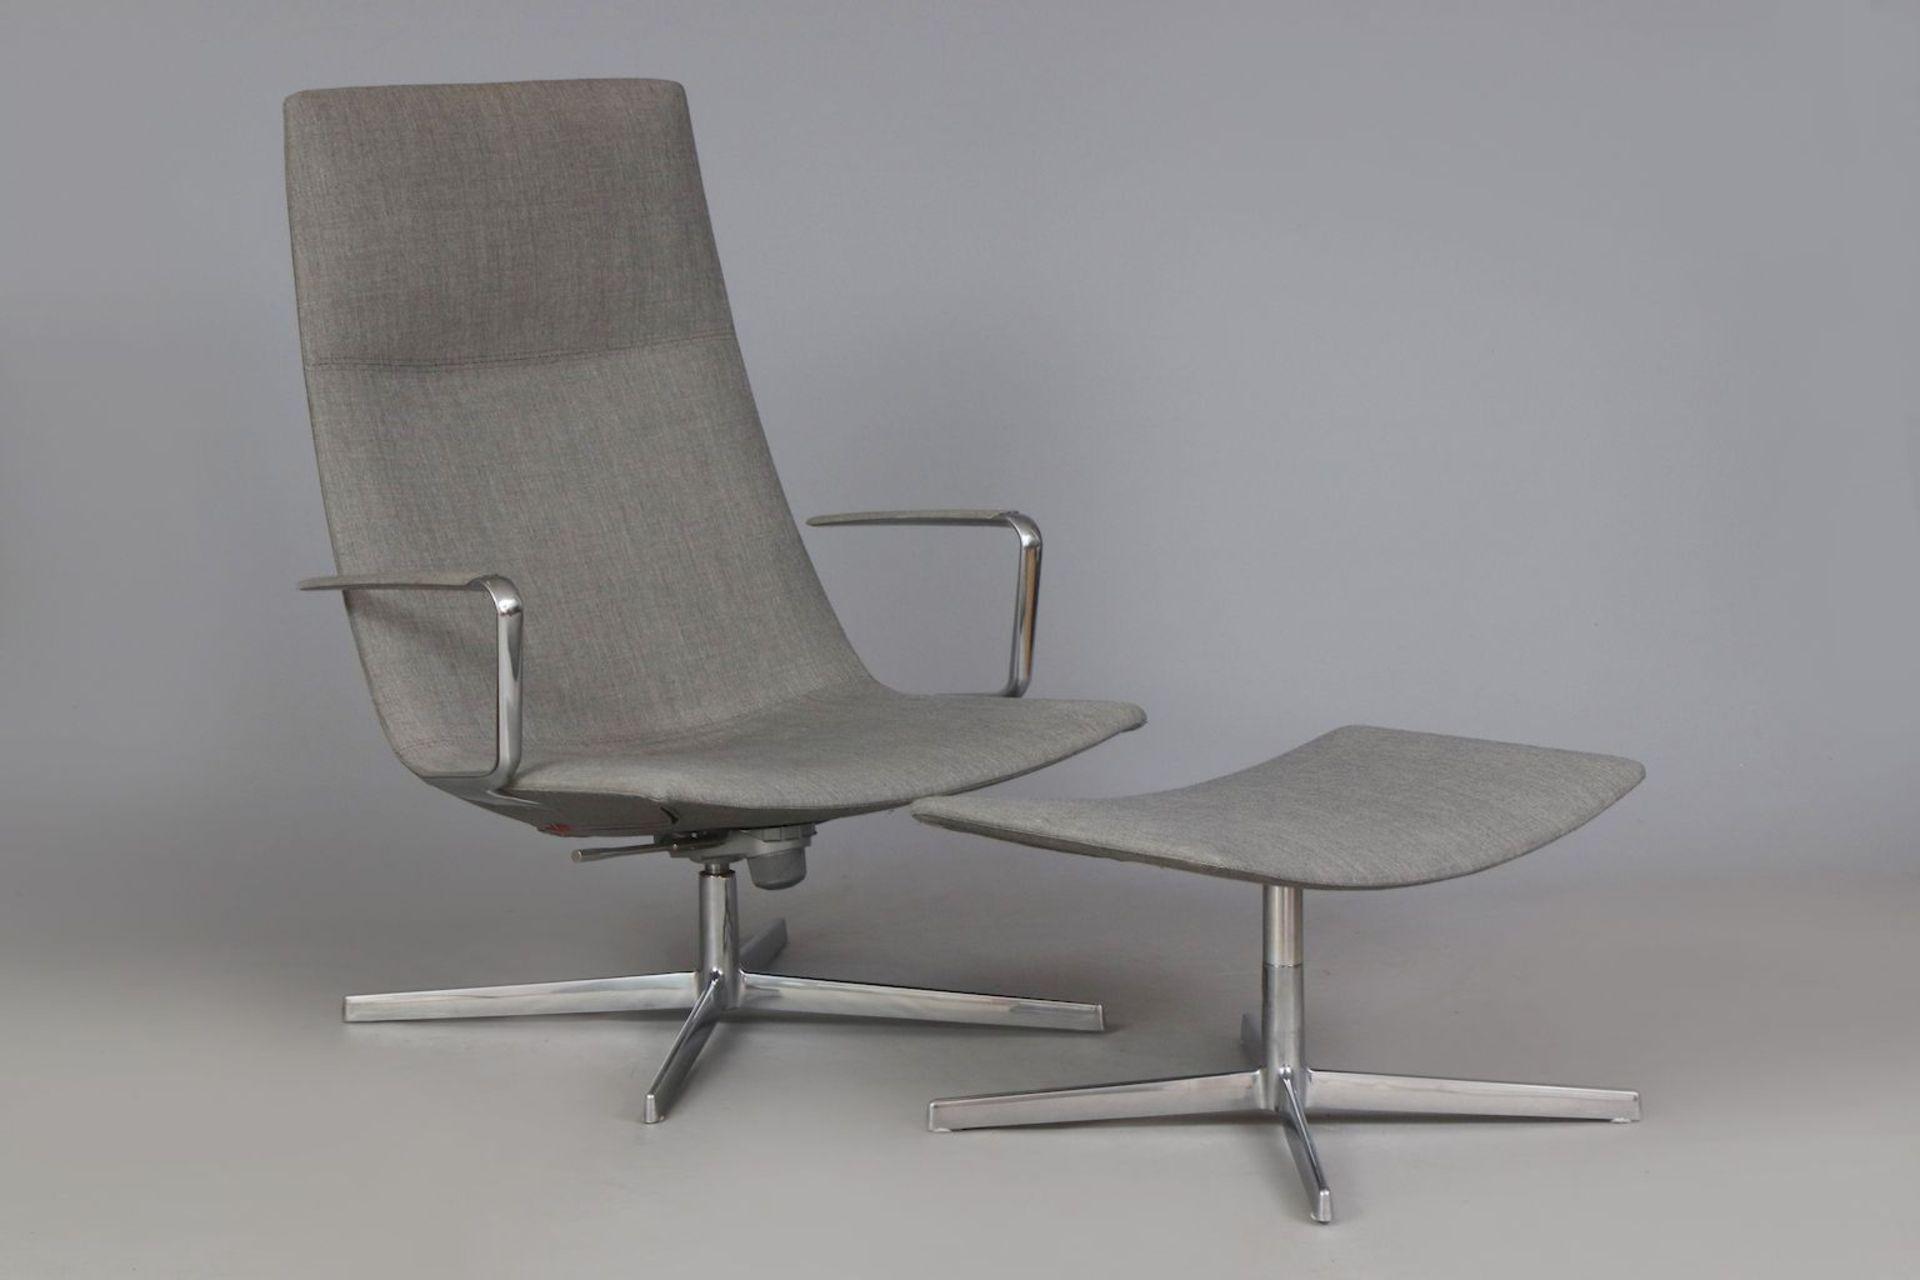 ARPER Italia ¨Catifa 70¨ Lounge chair mit Ottomane